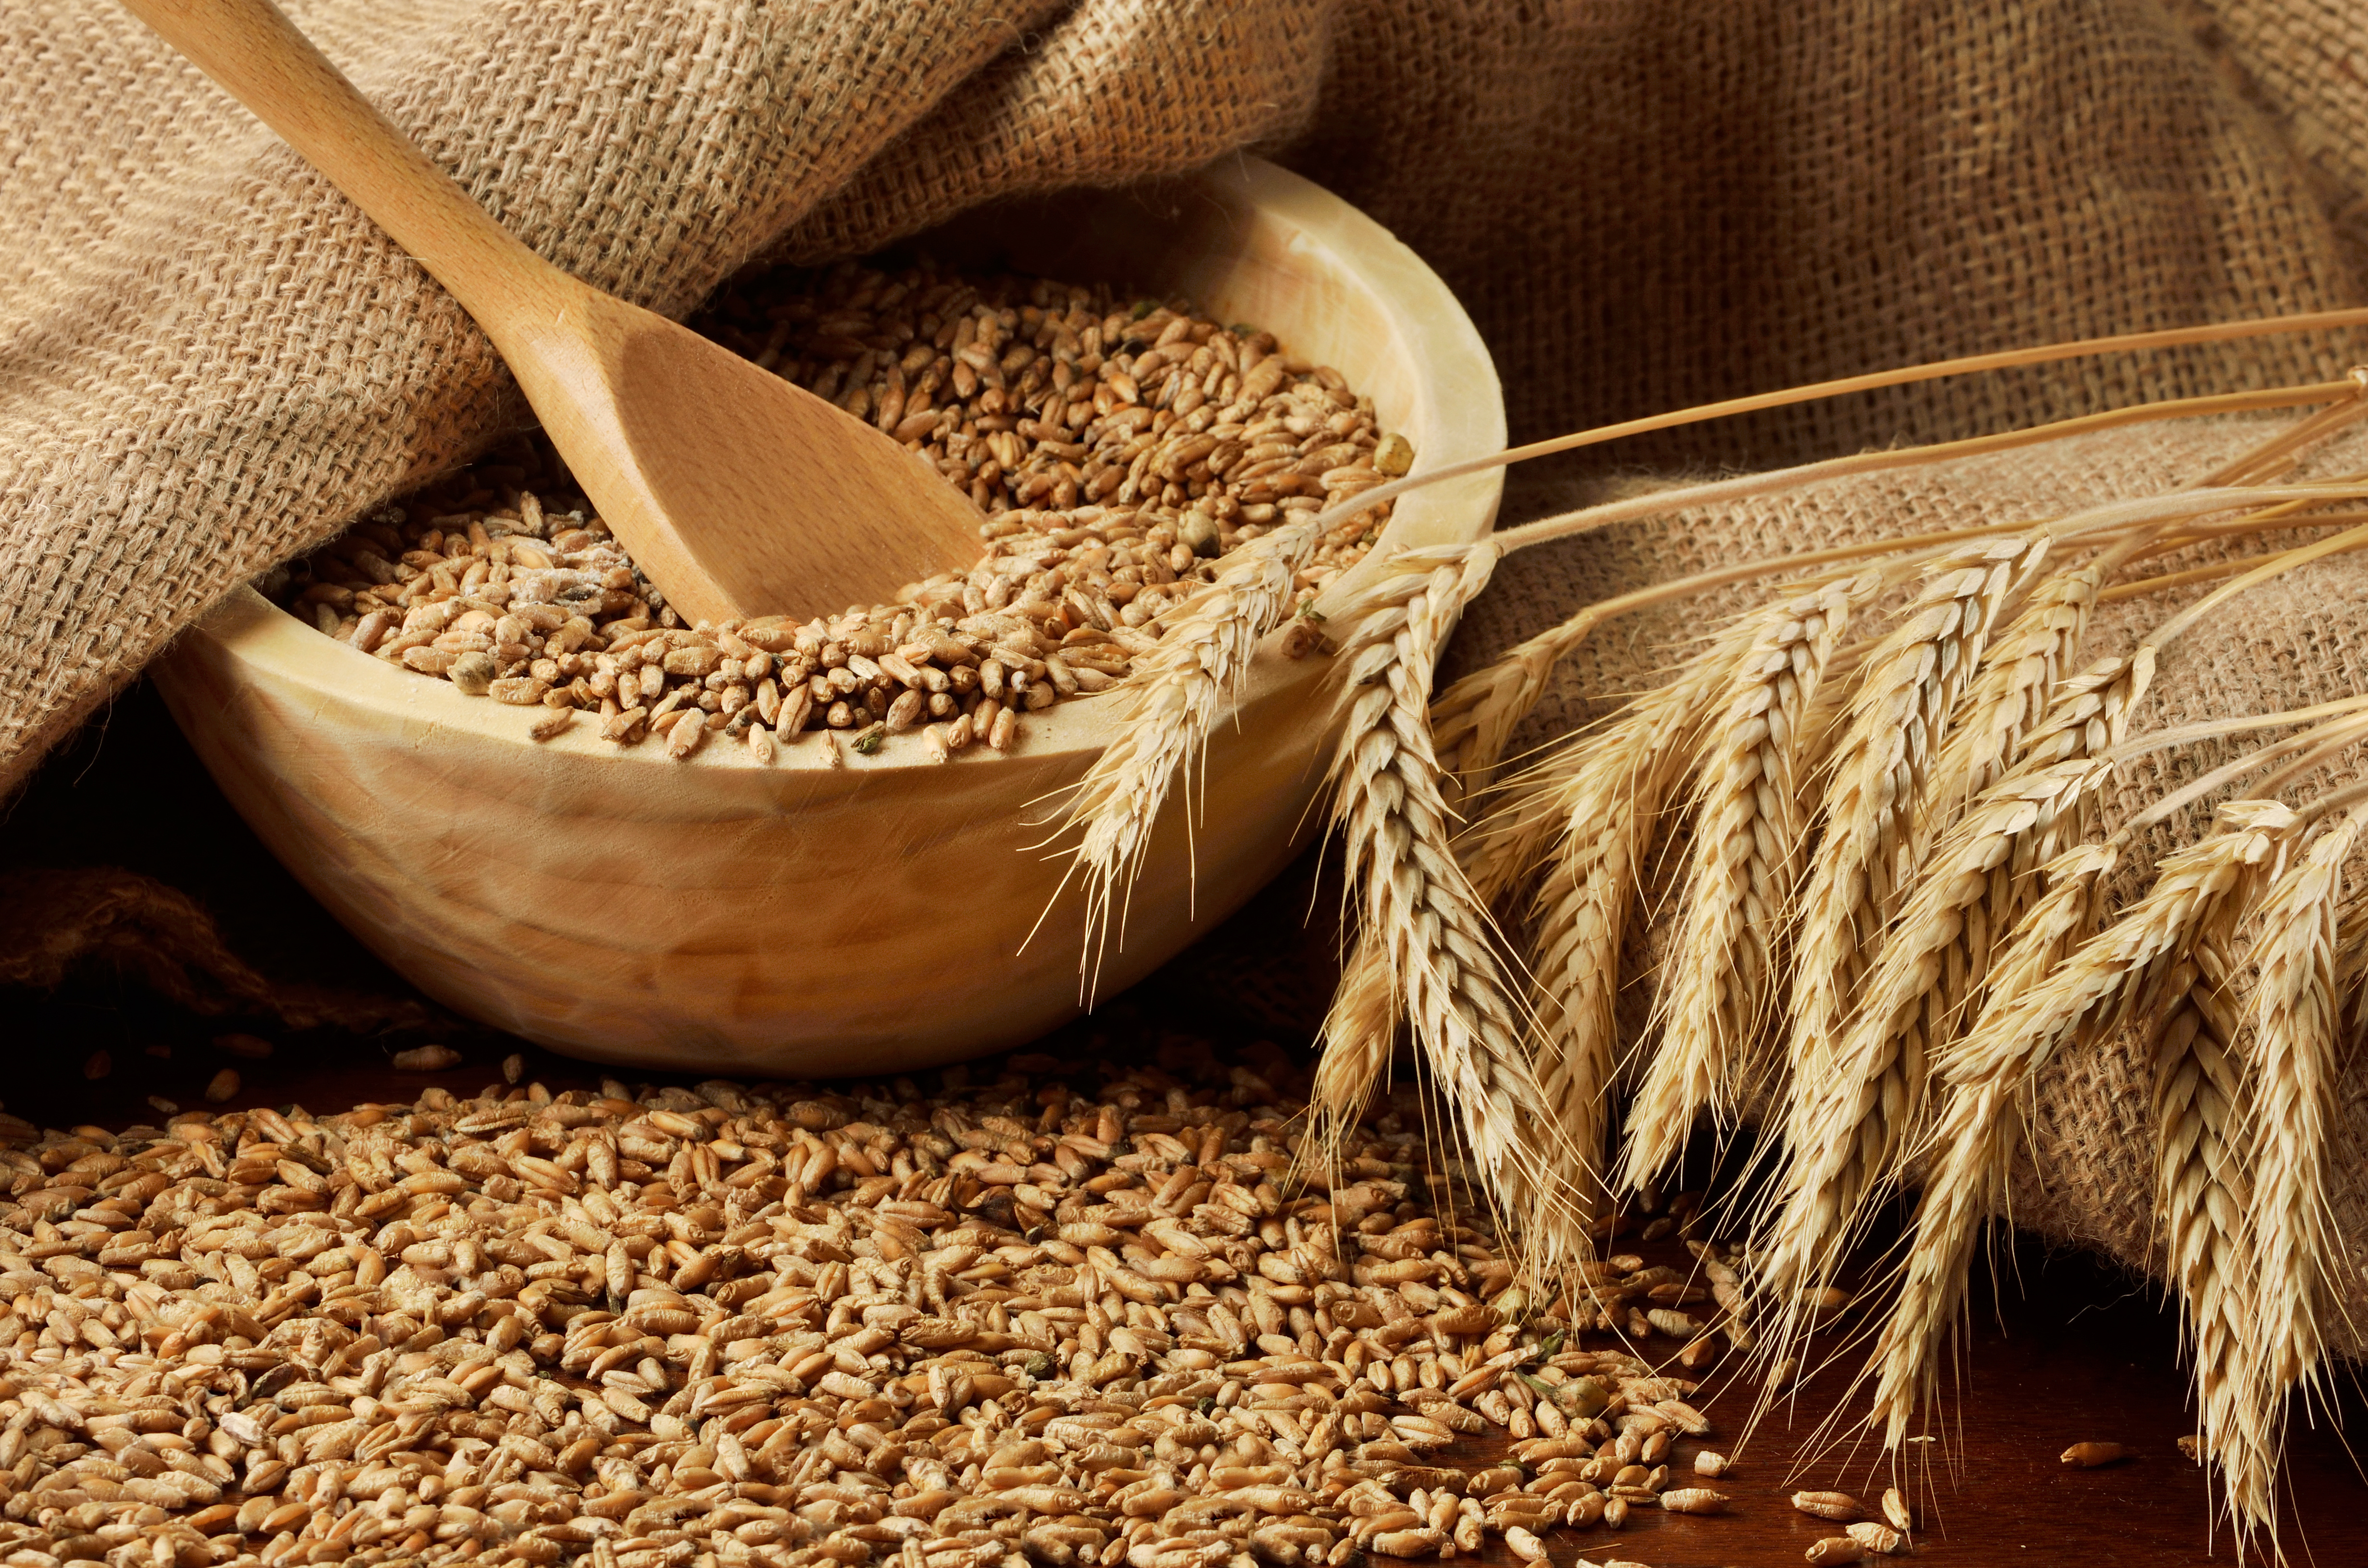 Wheat_adobestock_45878635